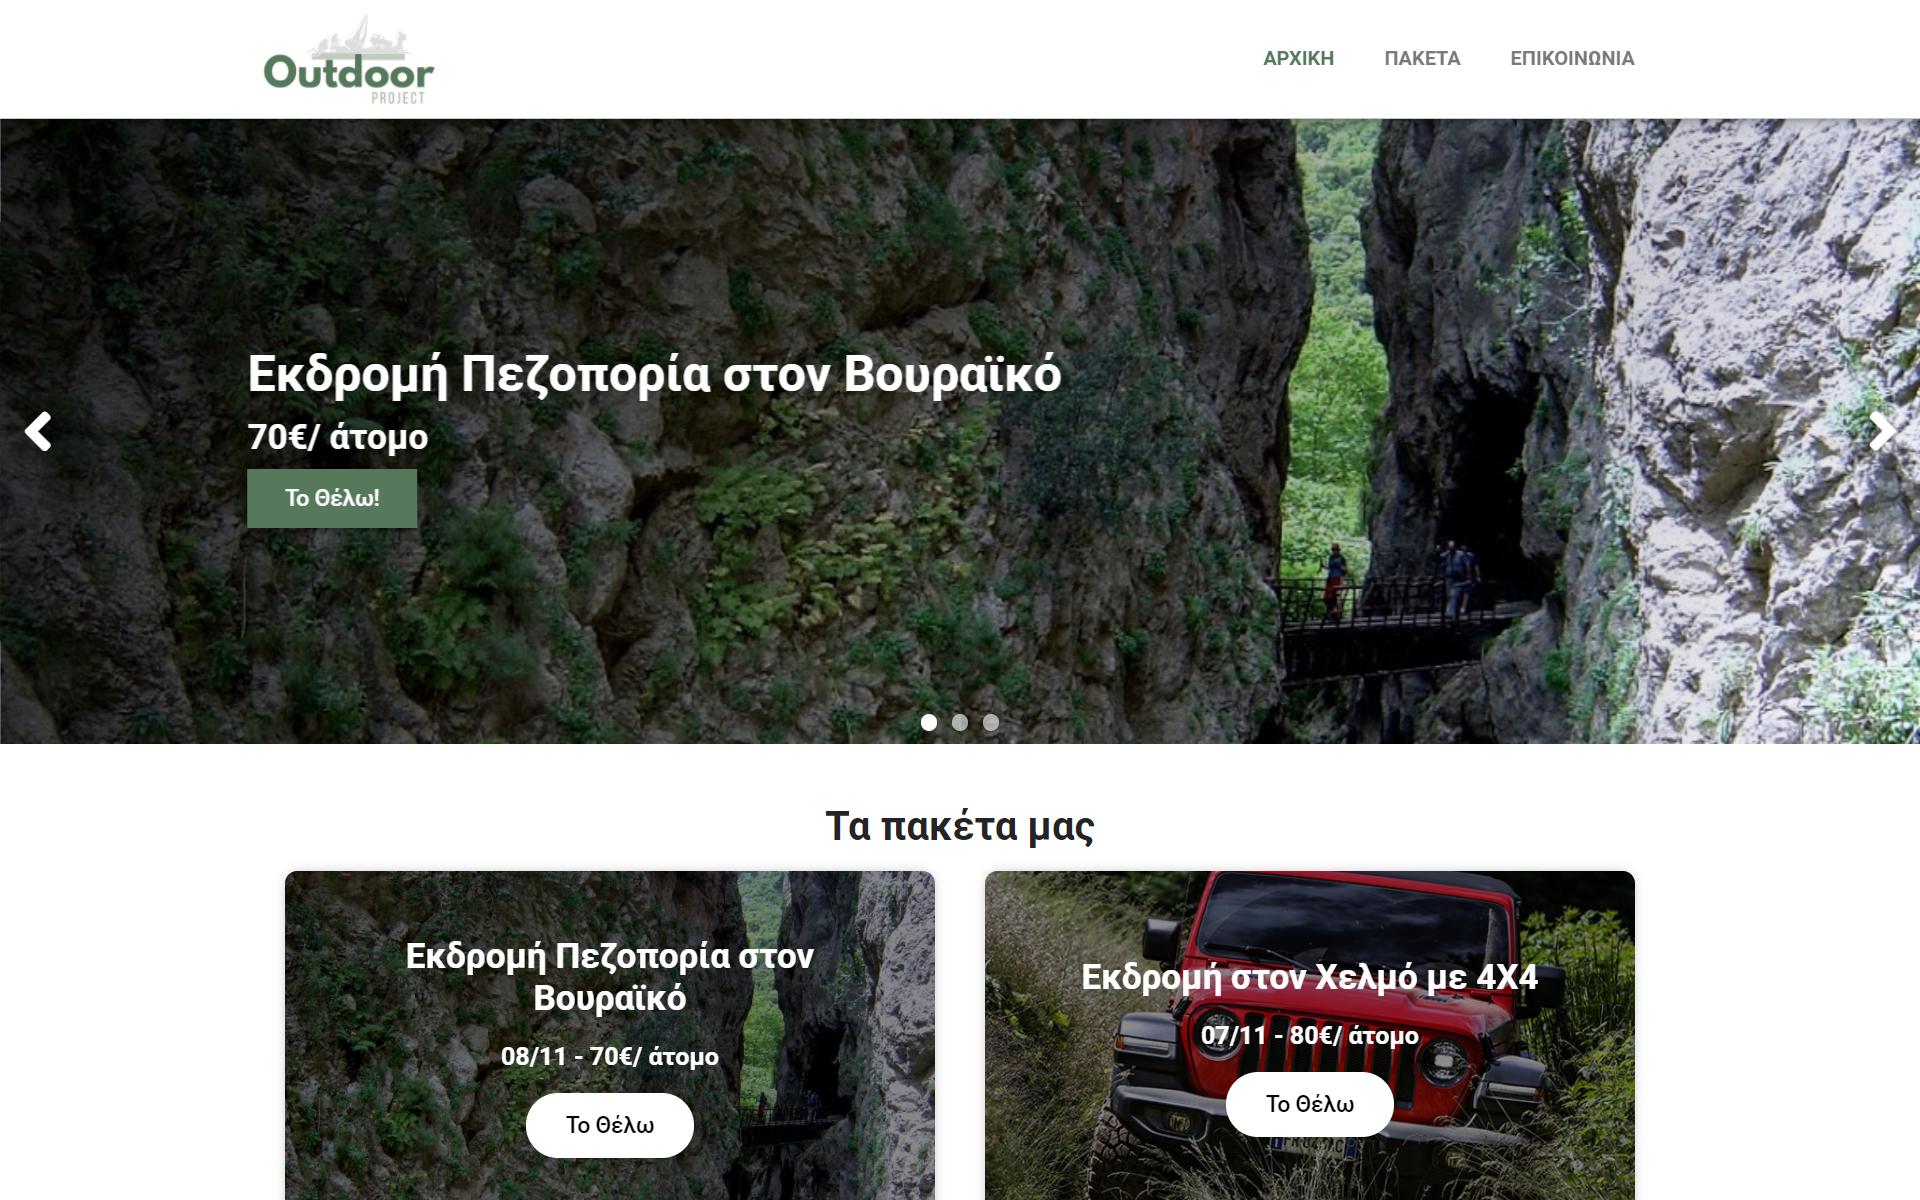 OutdoorProject.gr